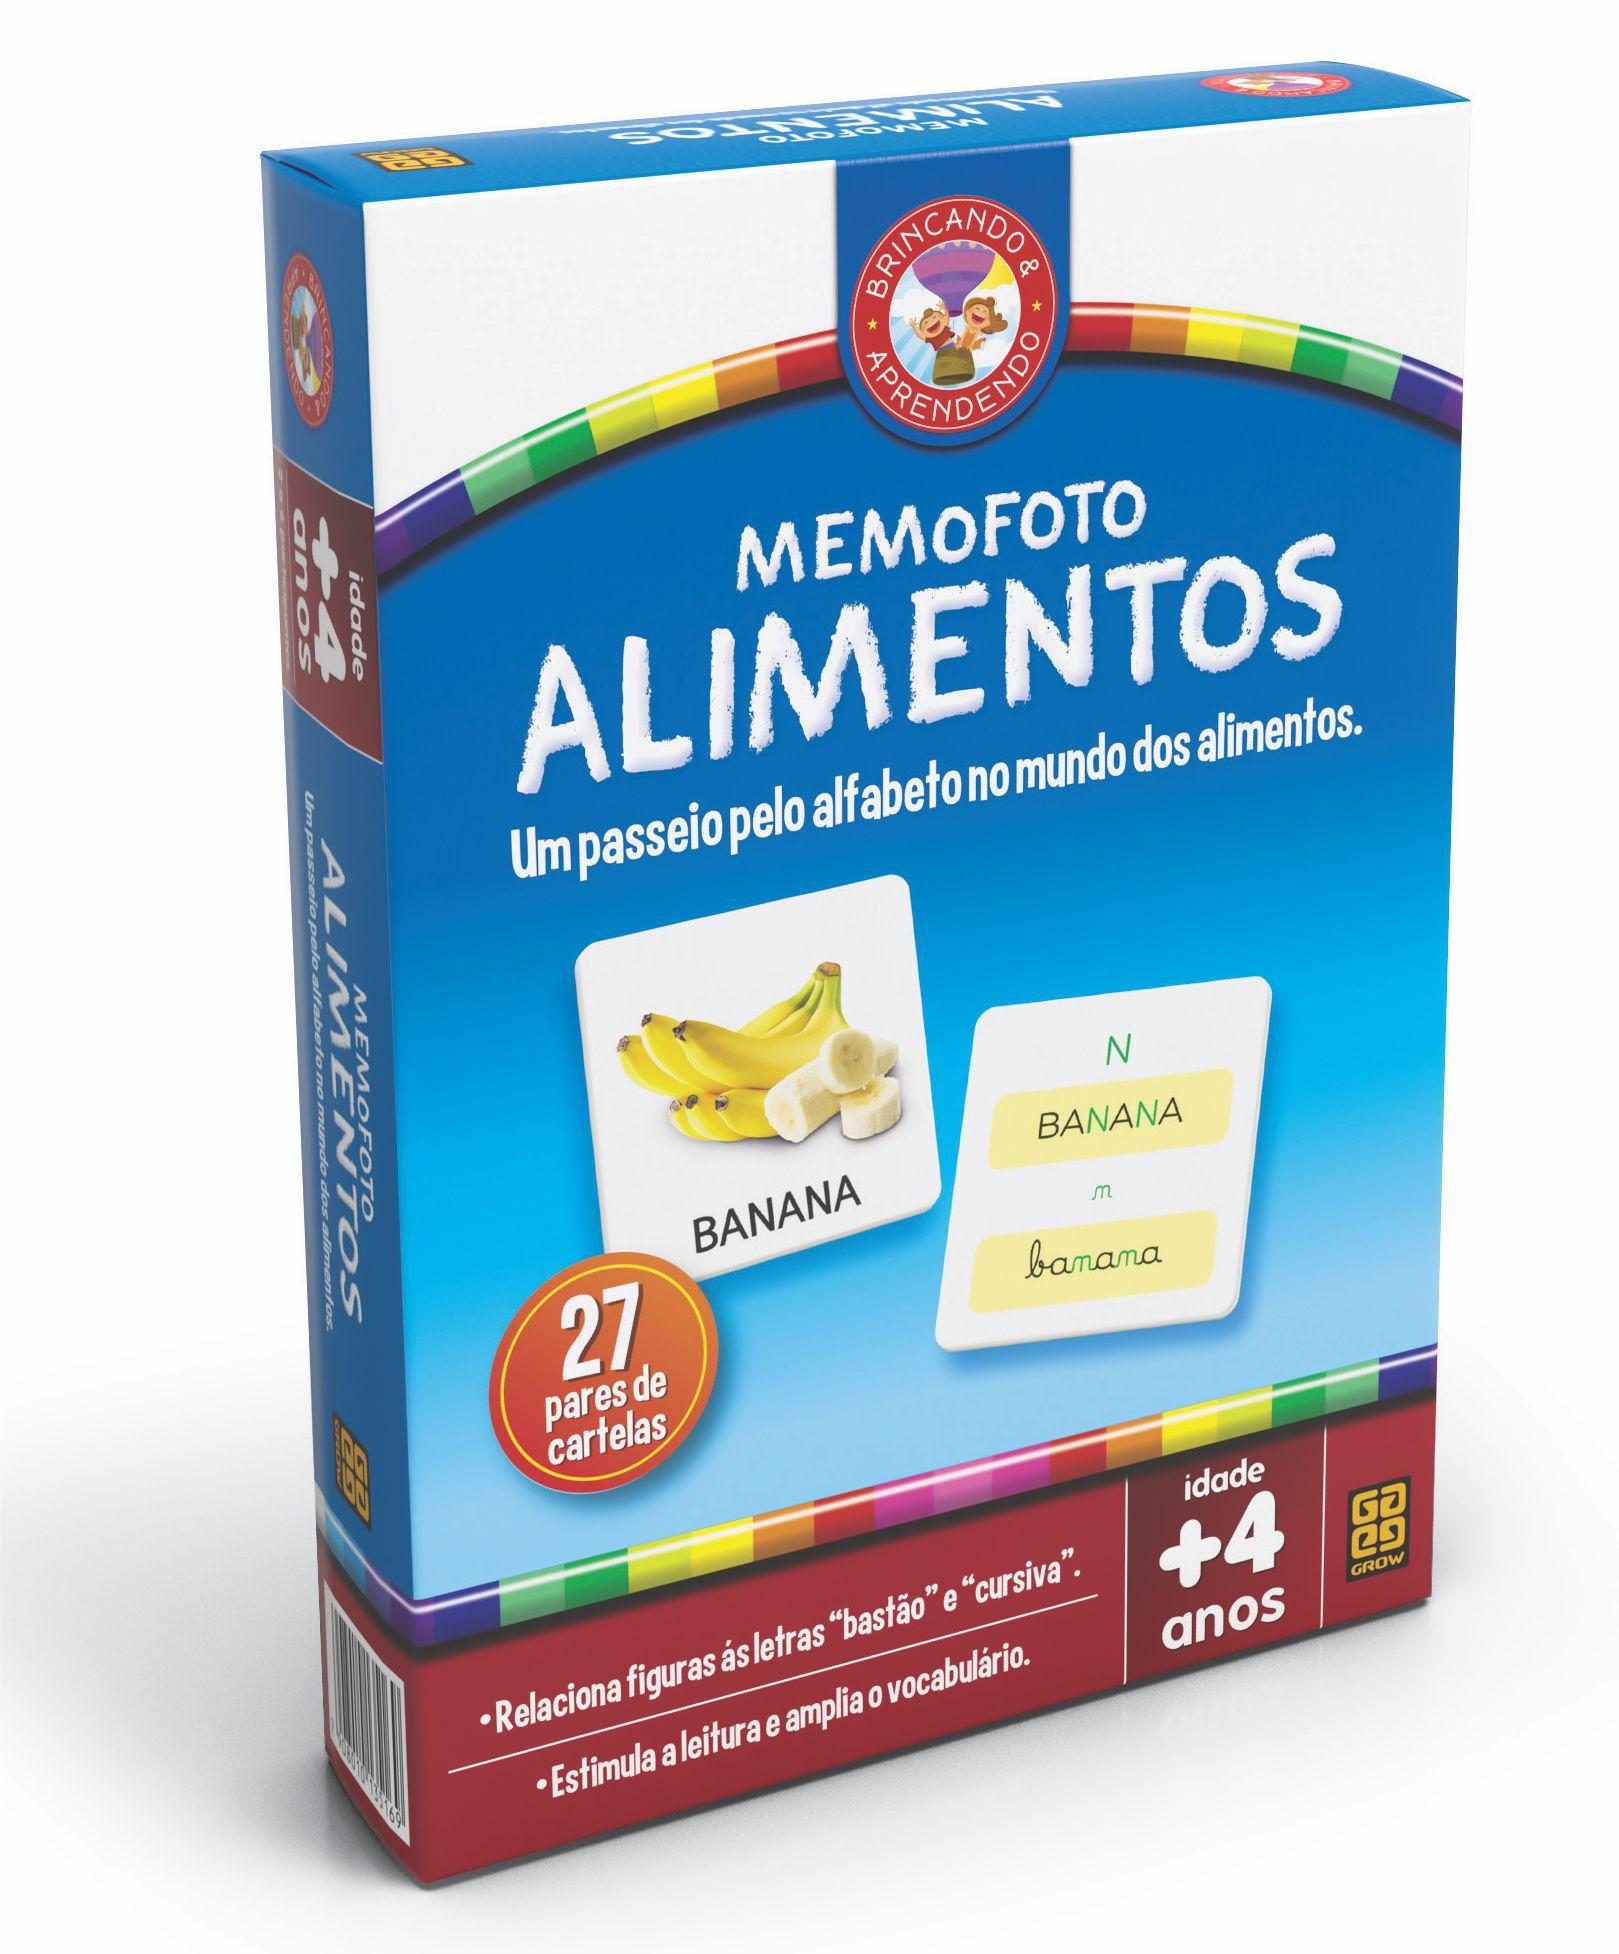 MEMOFOTO ALIMENTOS